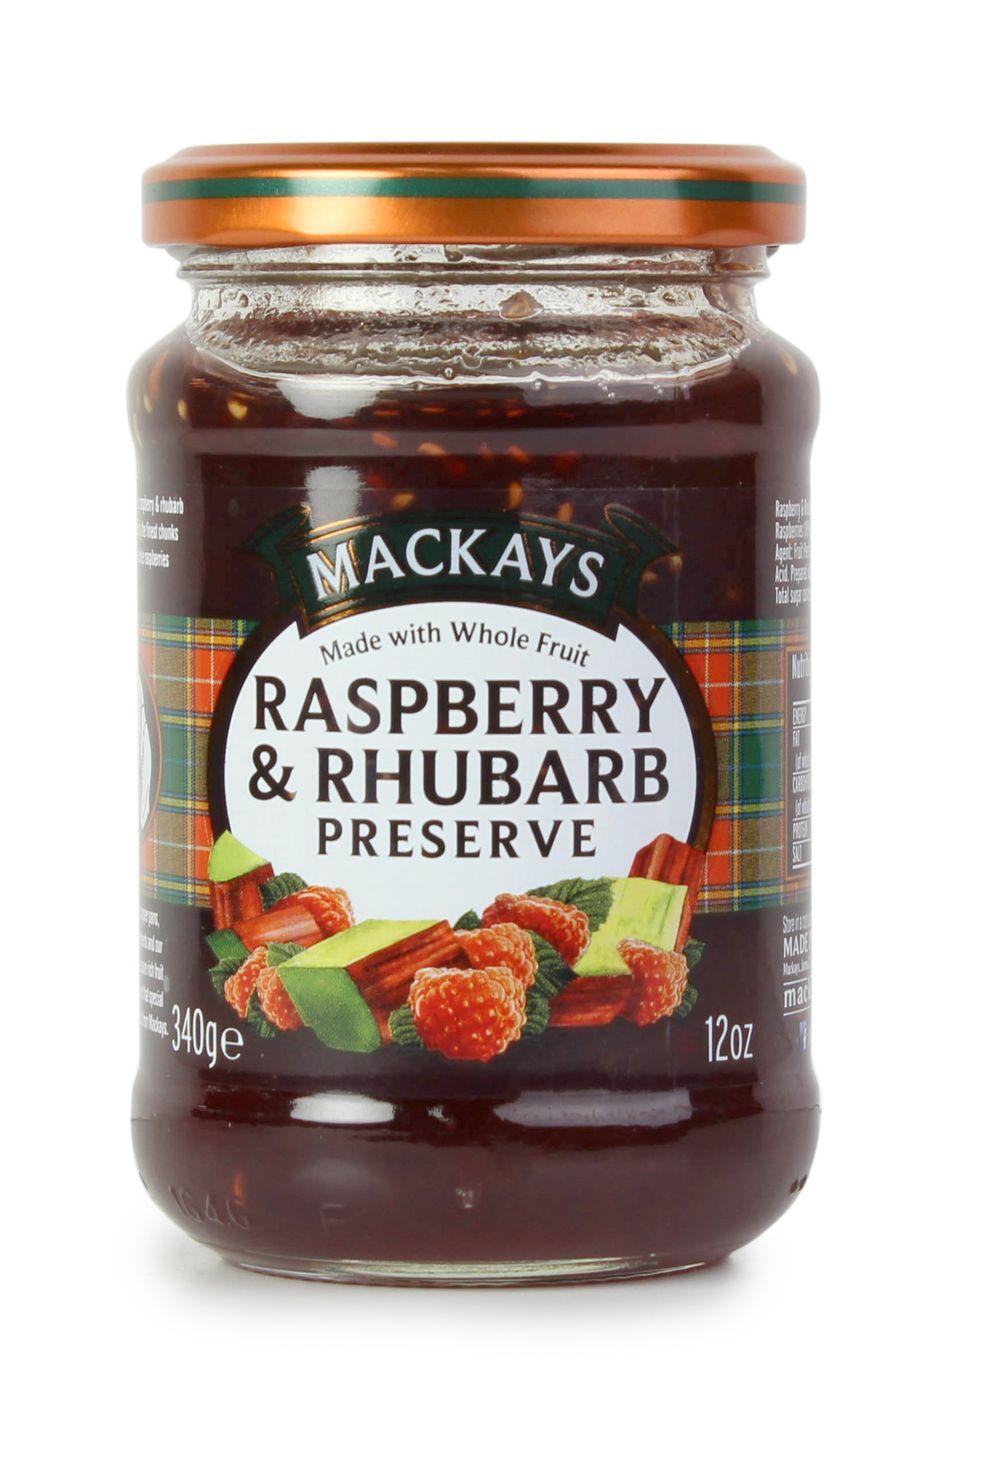 Raspberry & Rhubarb Preserve